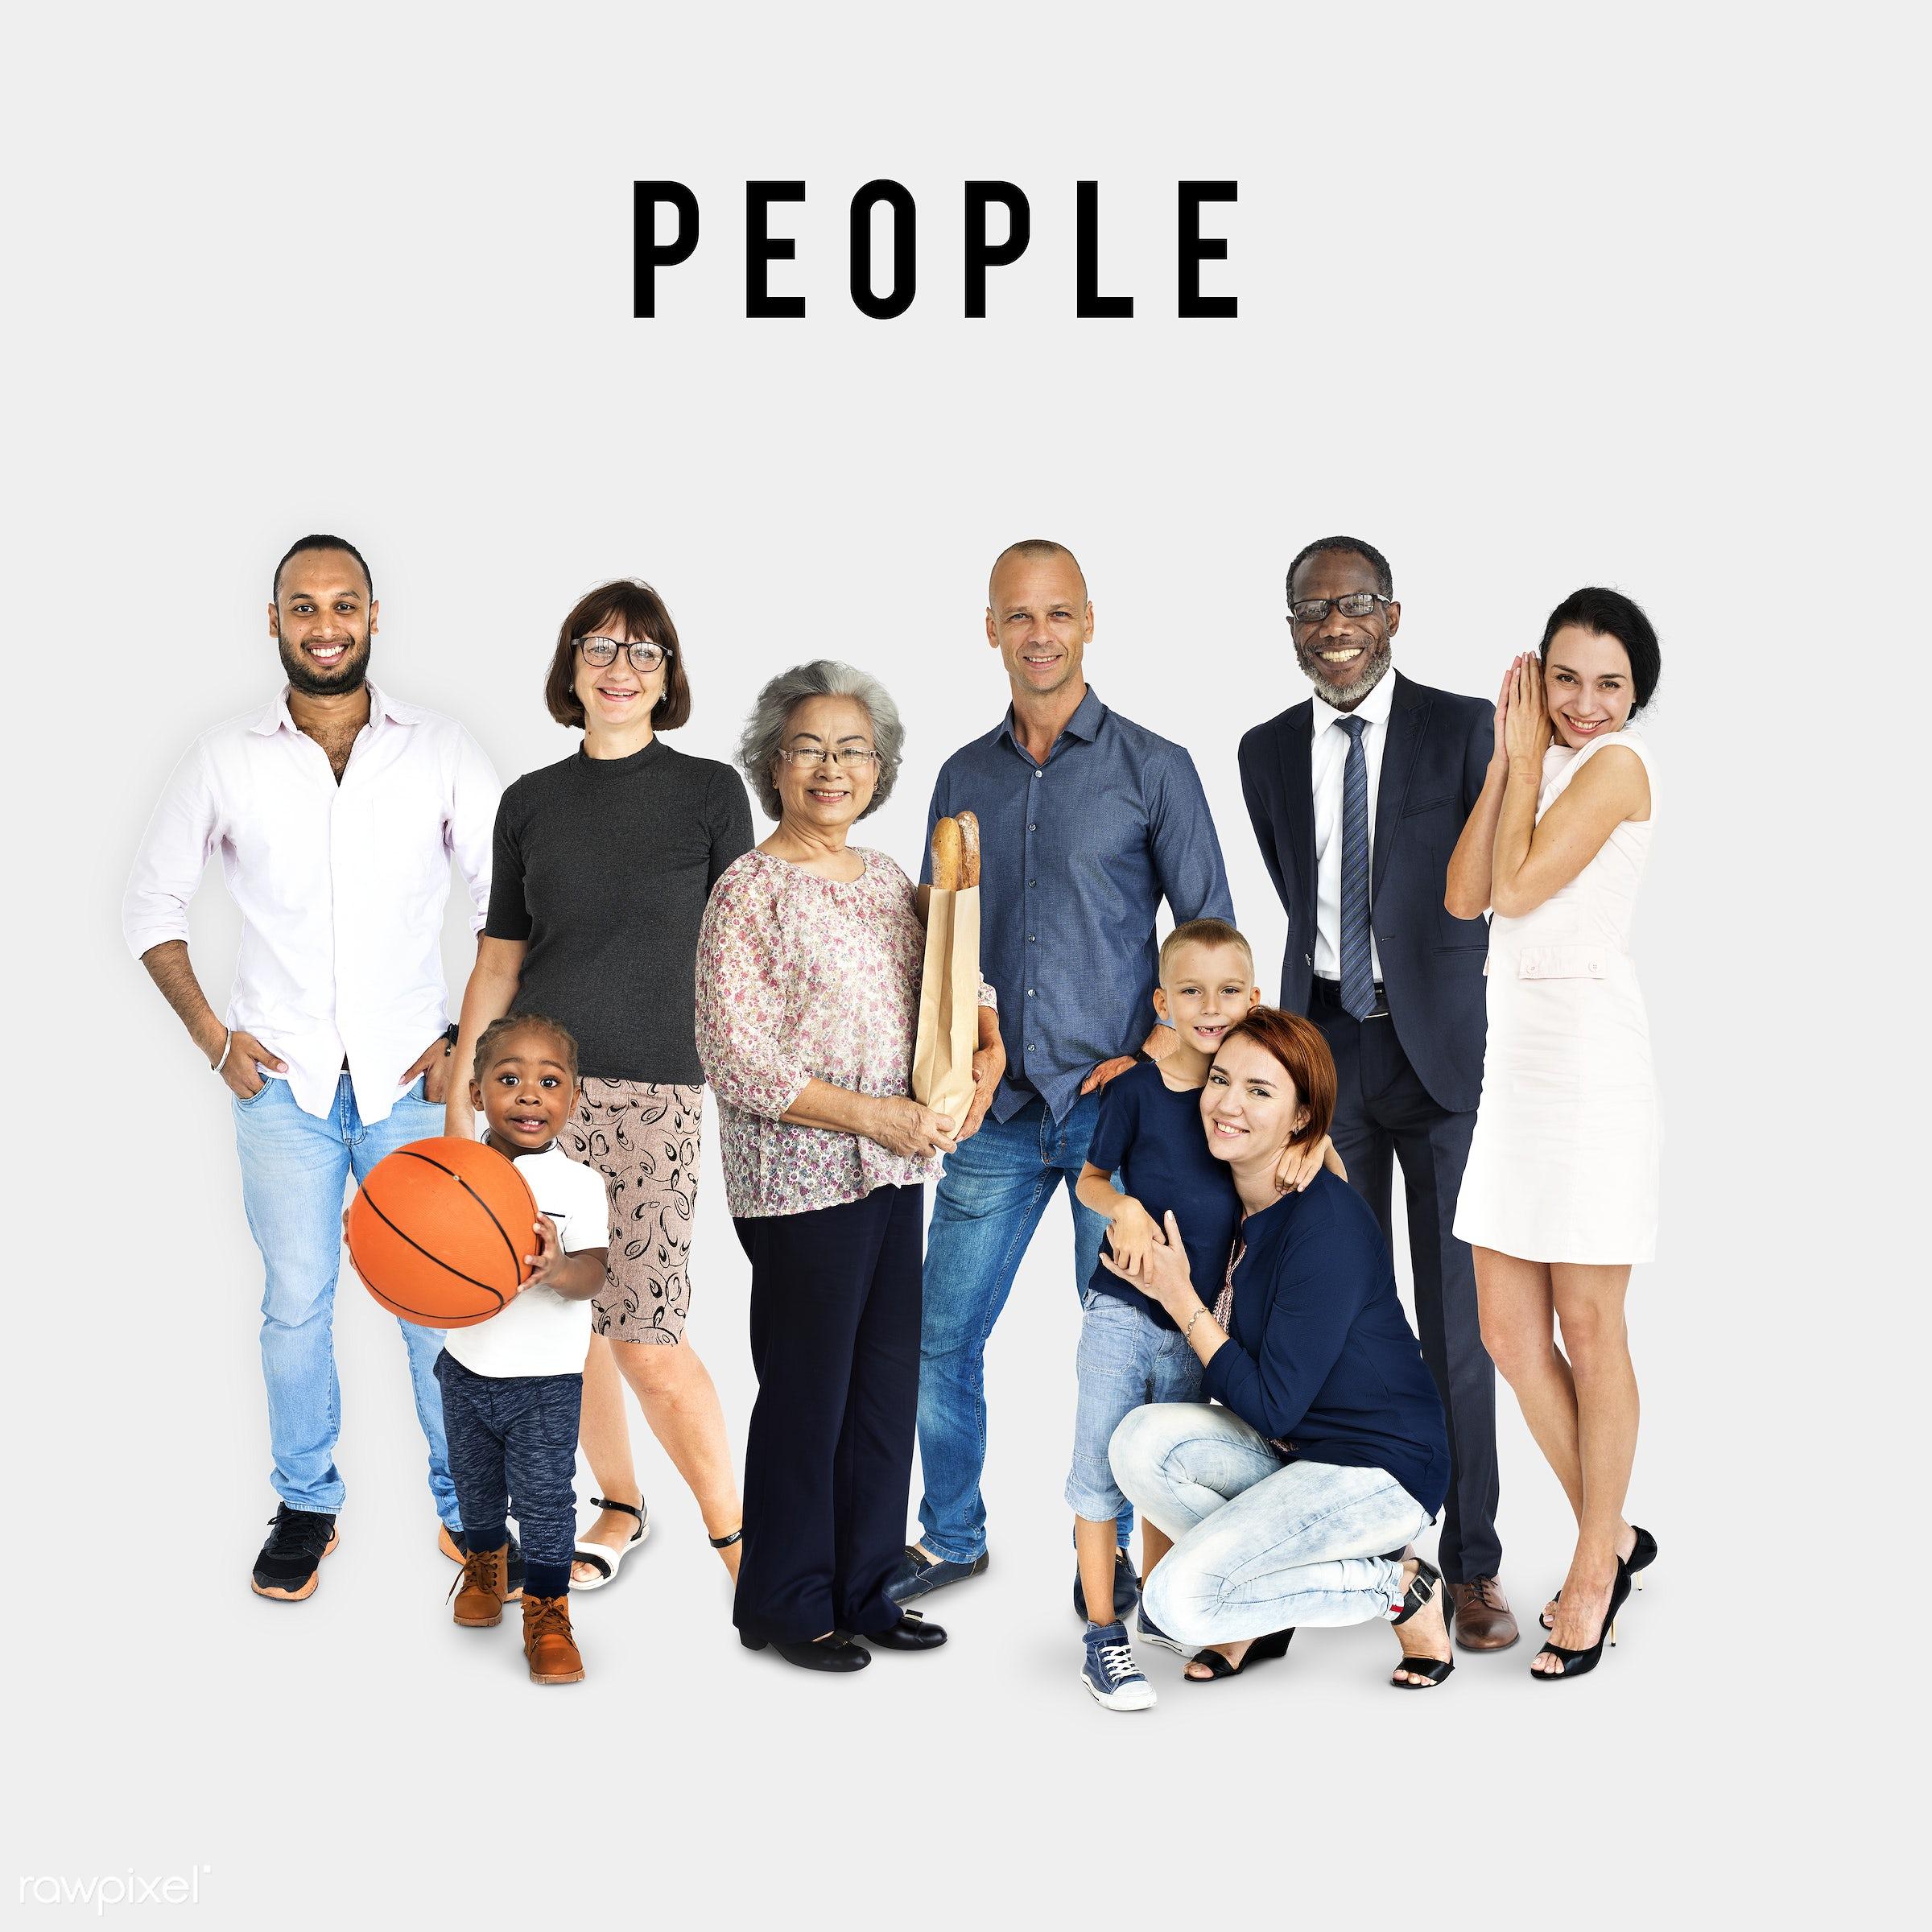 Diverse people set - gentlemen, studio, person, diverse, set, children, little, collection, people, attraction, together,...